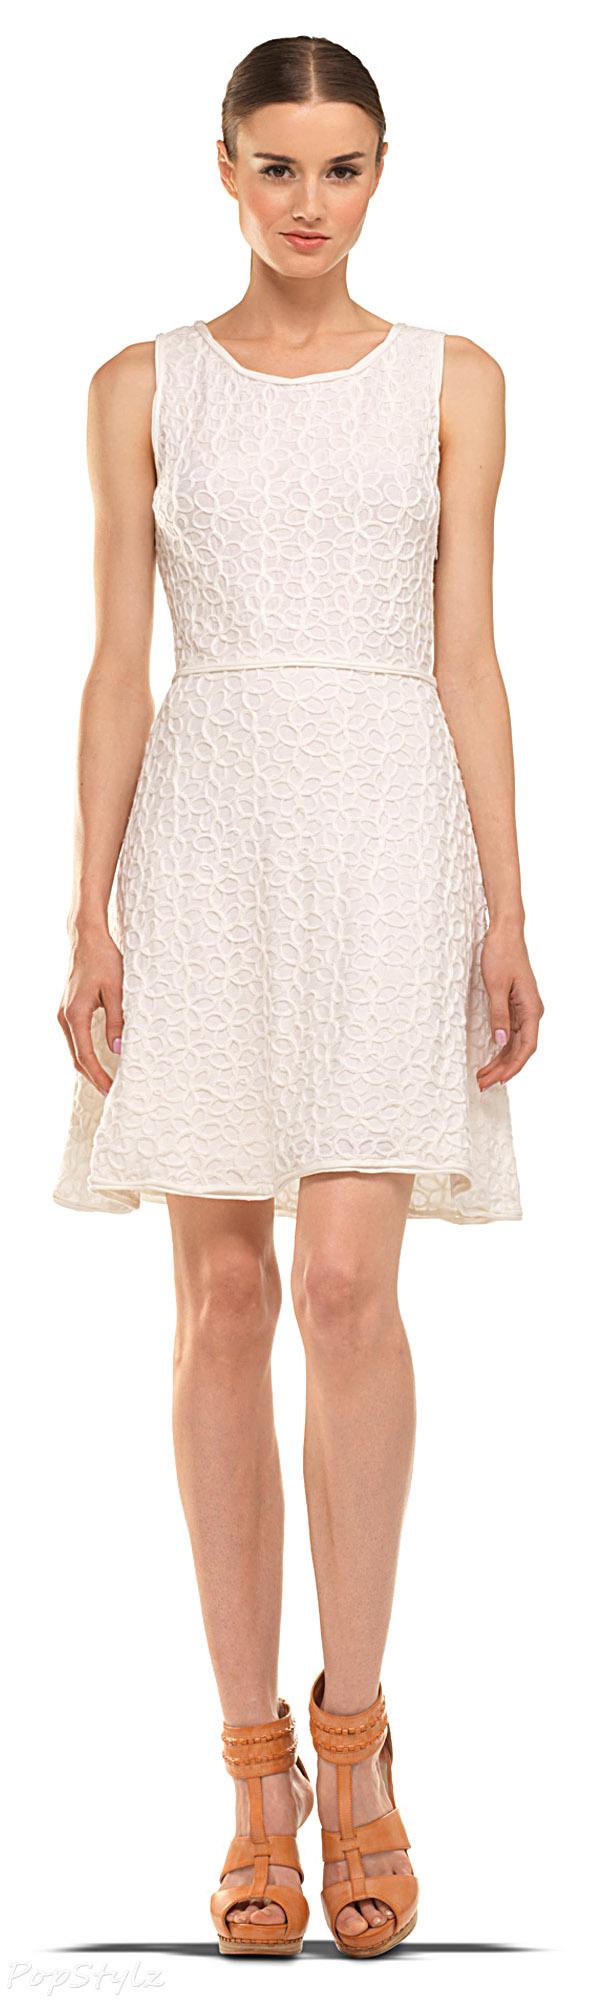 MAXSTUDIO Sleeveless Fit Flare Dress